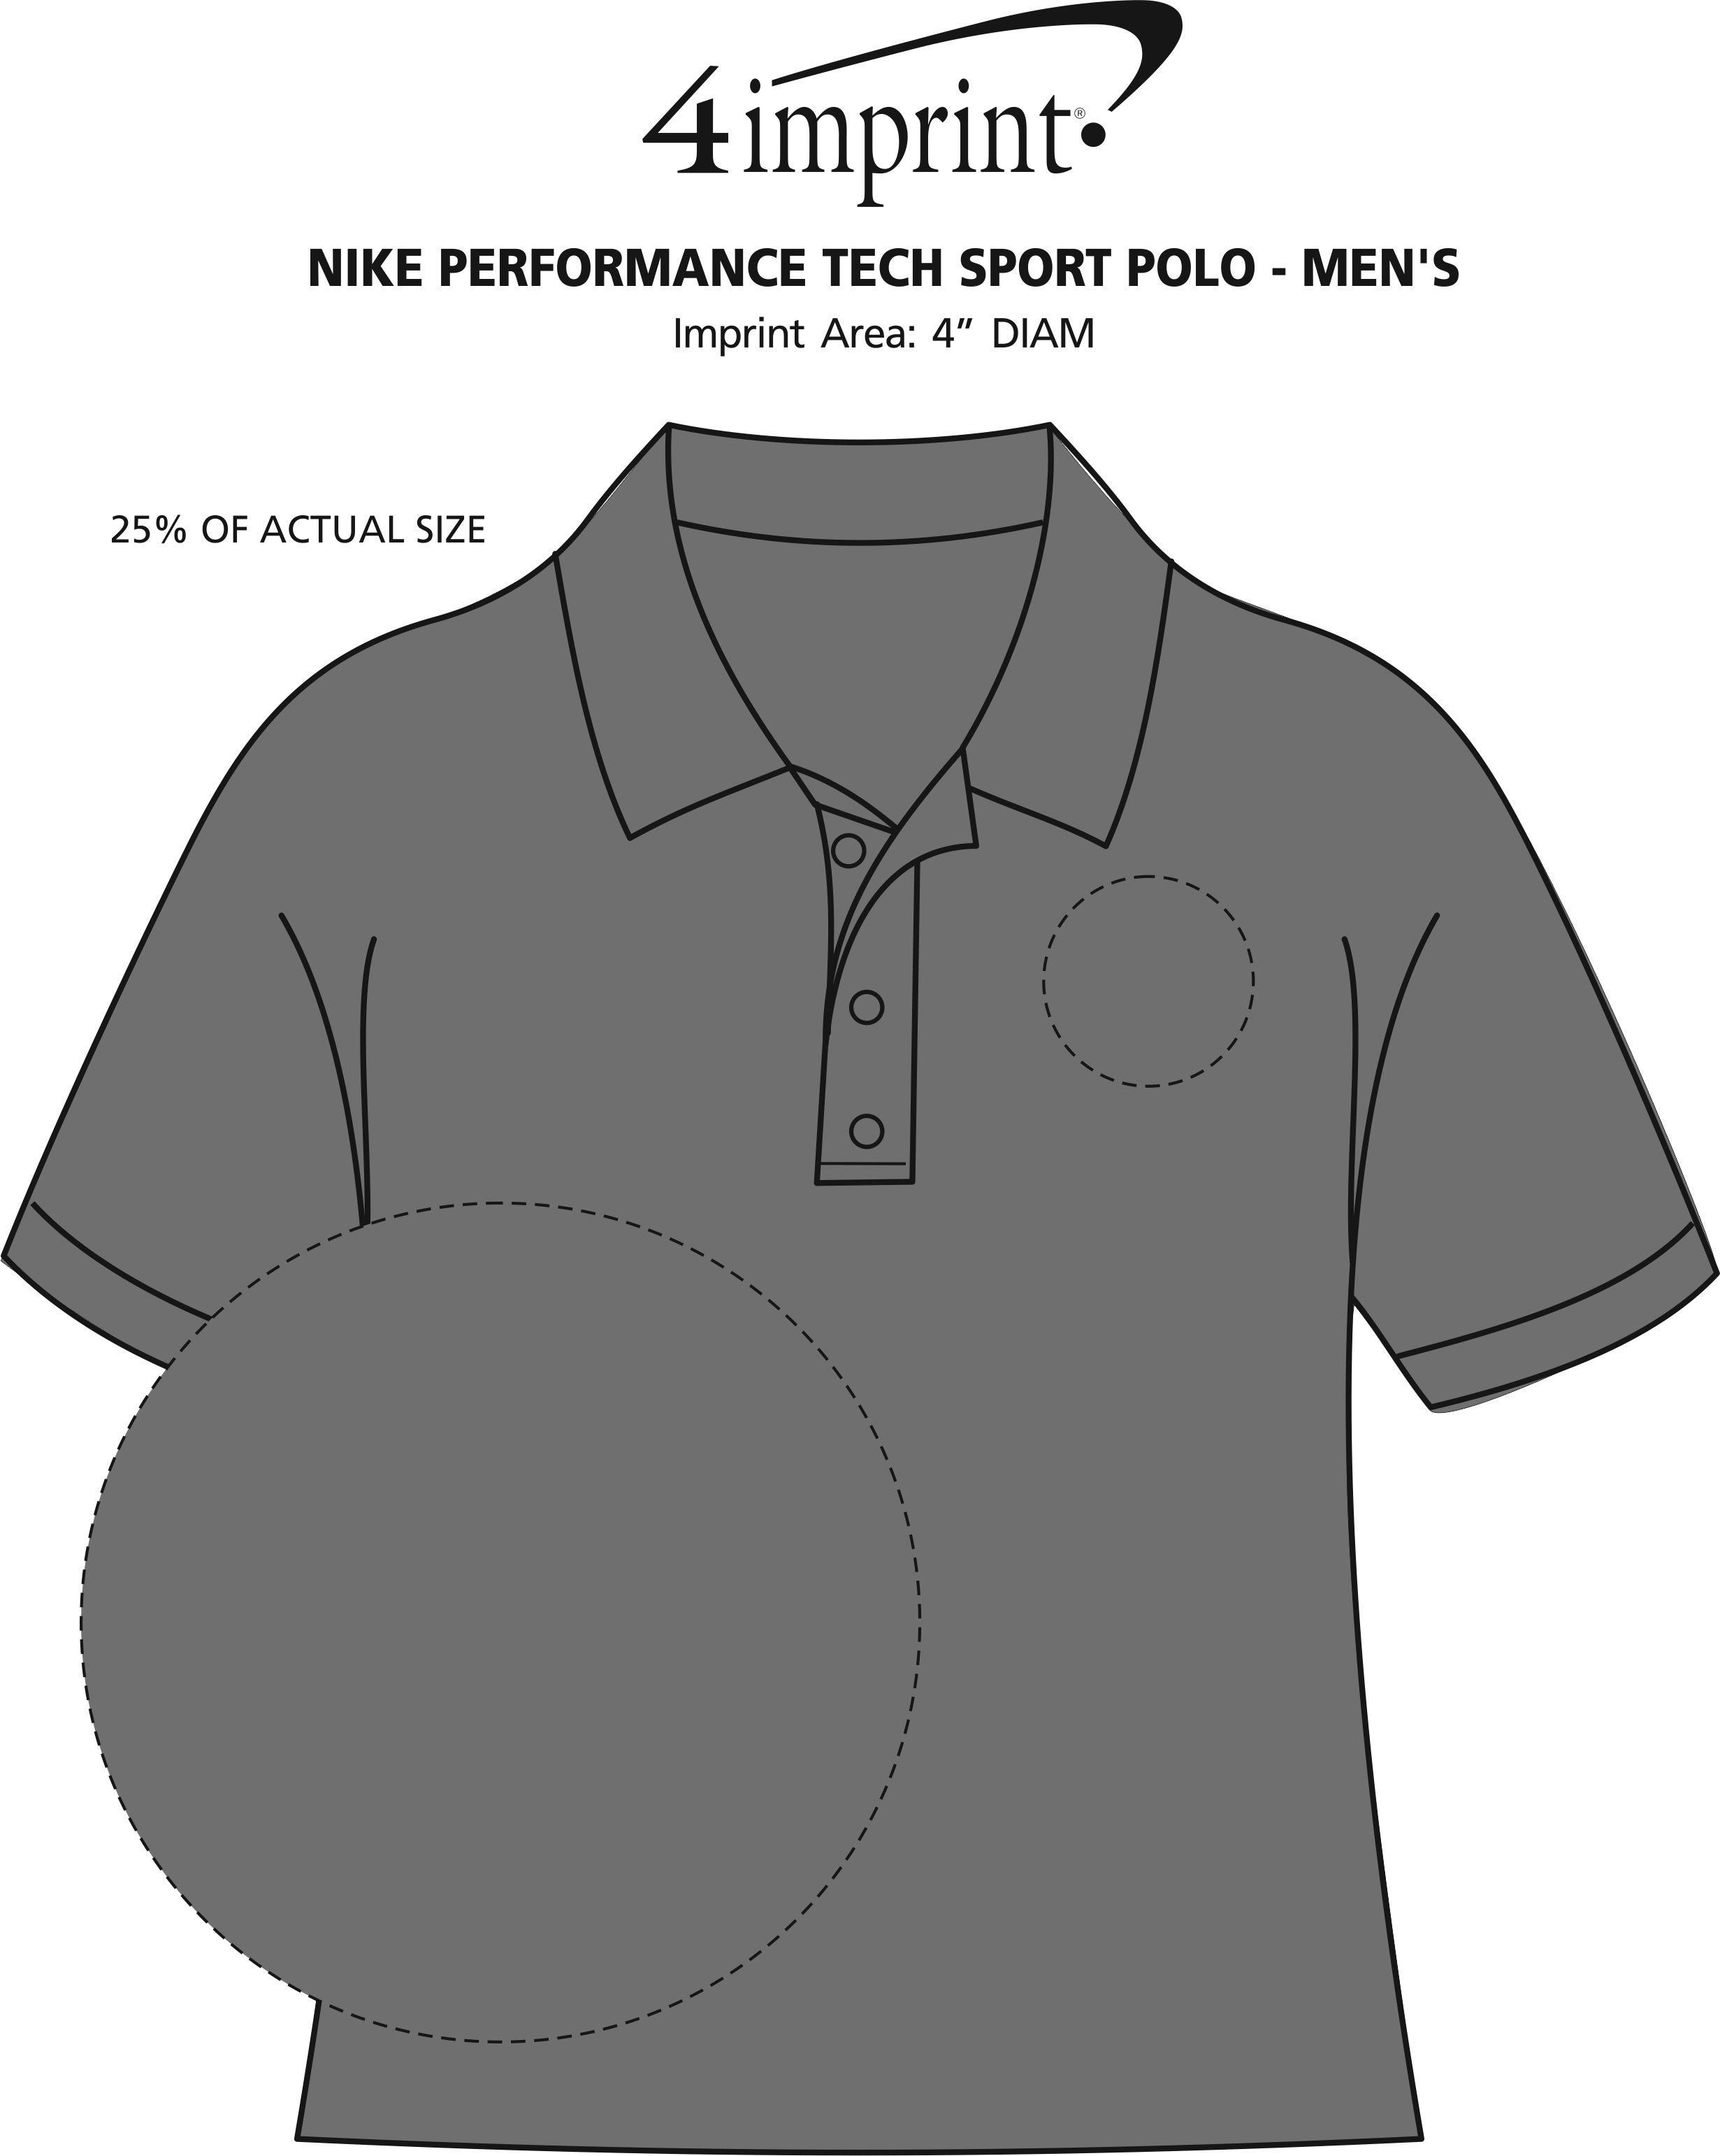 Imprint Area of Nike Performance Tech Sport Polo - Men's